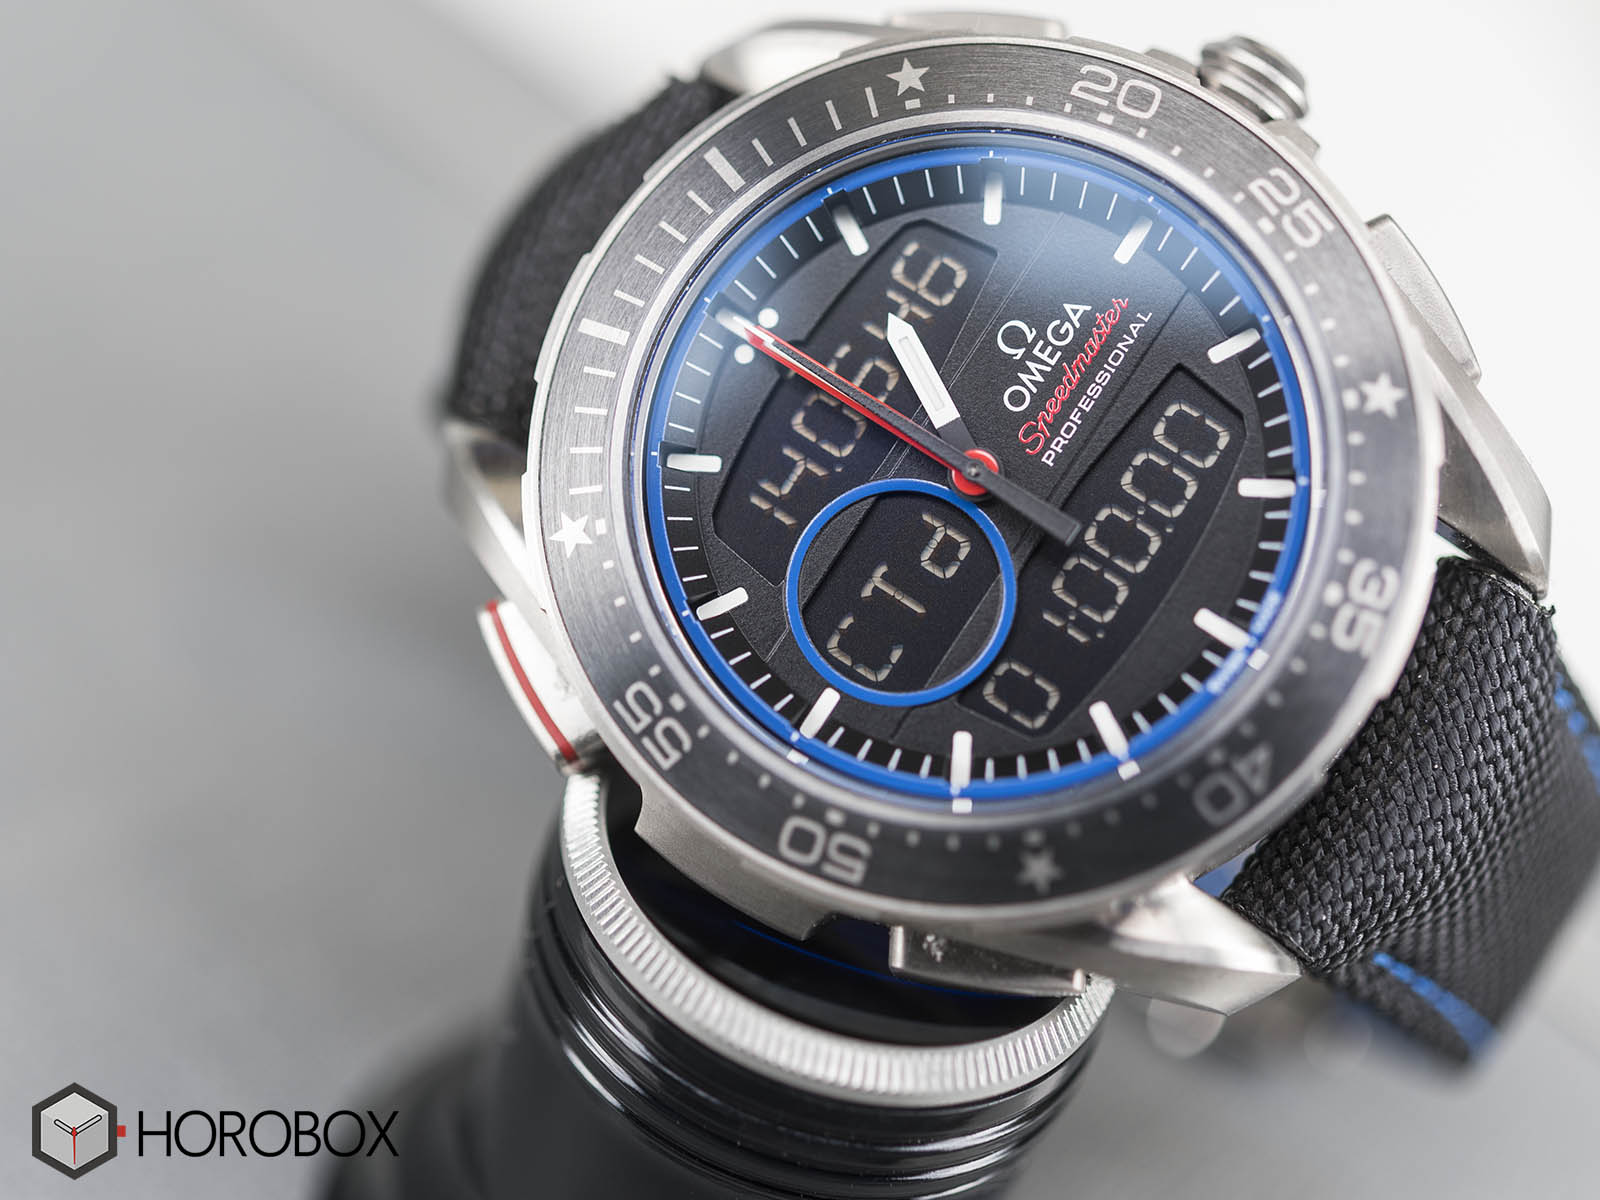 omega-speedmaster-x-33-regatta-chronograph-318-92-45-79-01-001-1-.jpg